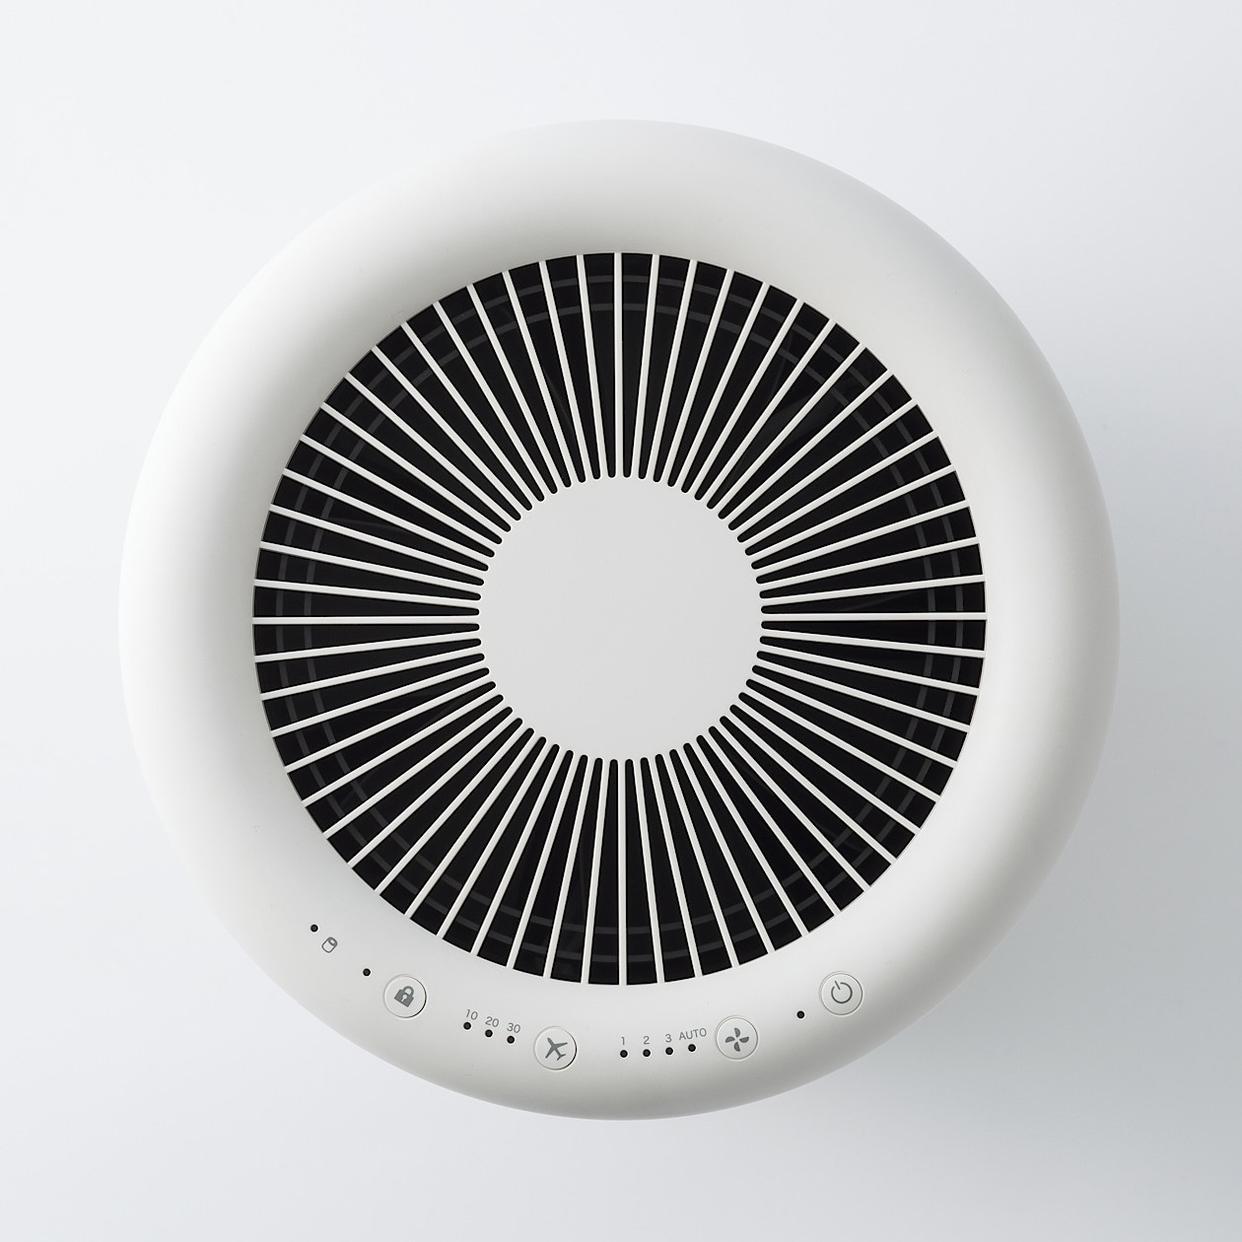 無印良品(MUJI) 空気清浄機 MJ-AP1の商品画像9